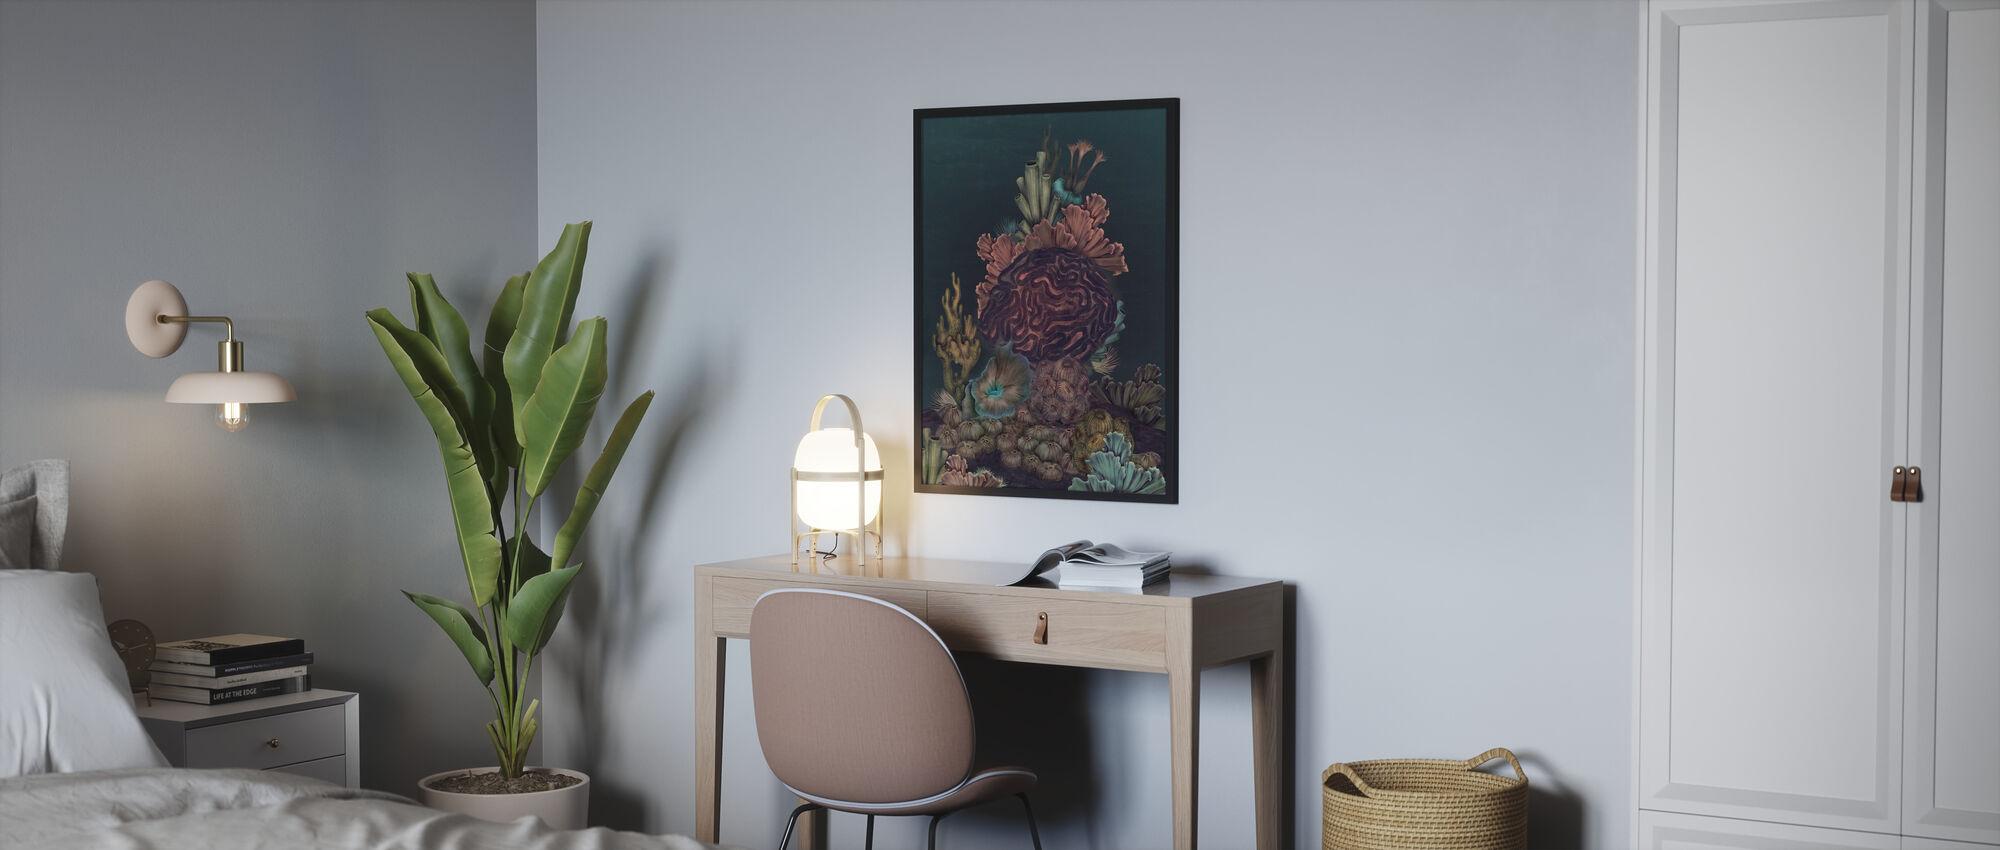 Shiny Corals - Poster - Bedroom